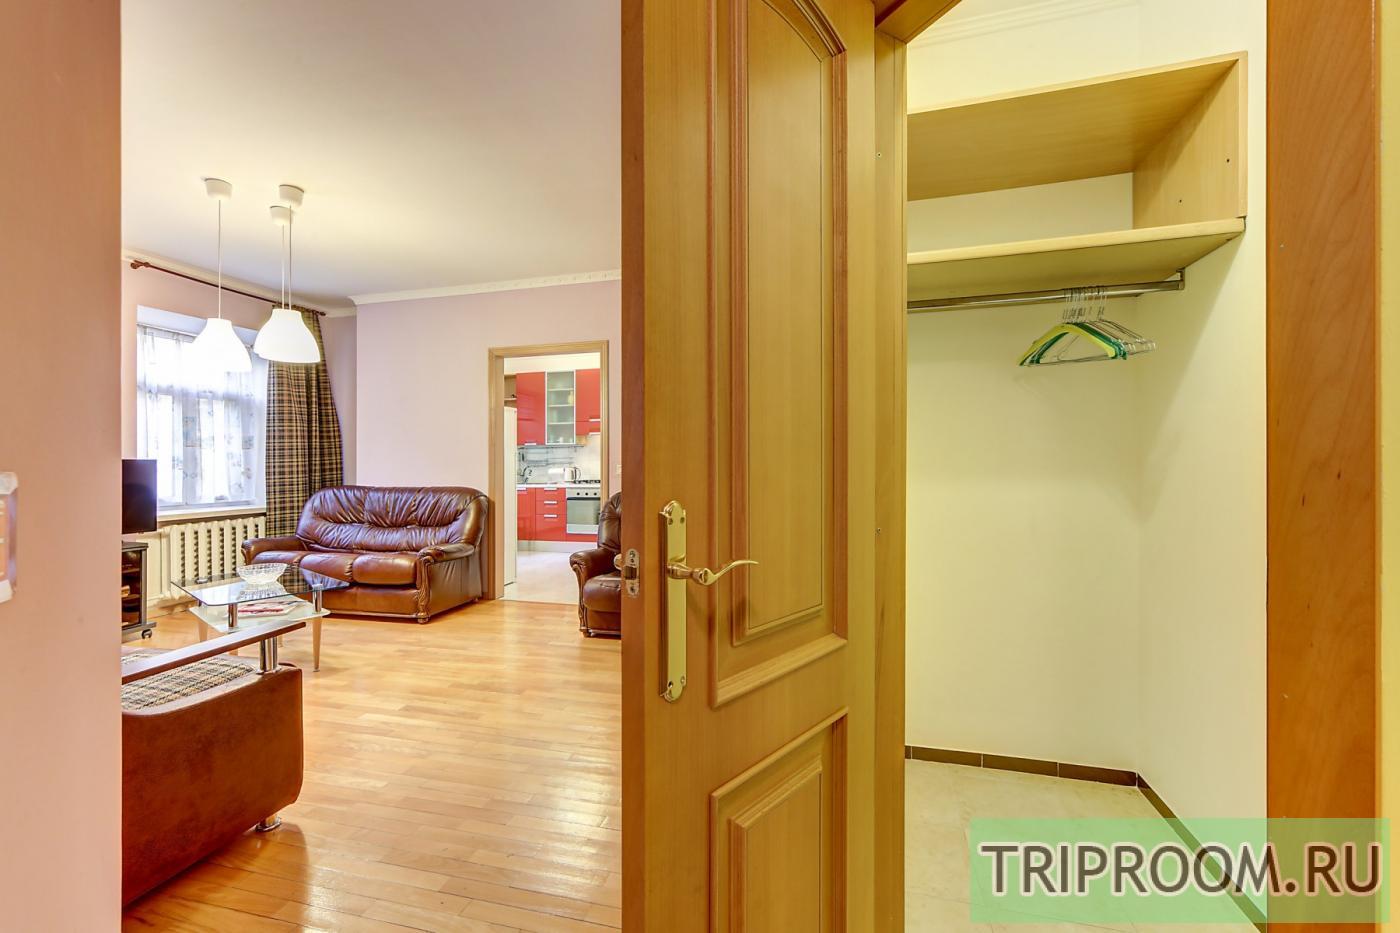 2-комнатная квартира посуточно (вариант № 20143), ул. Невский проспект, фото № 13